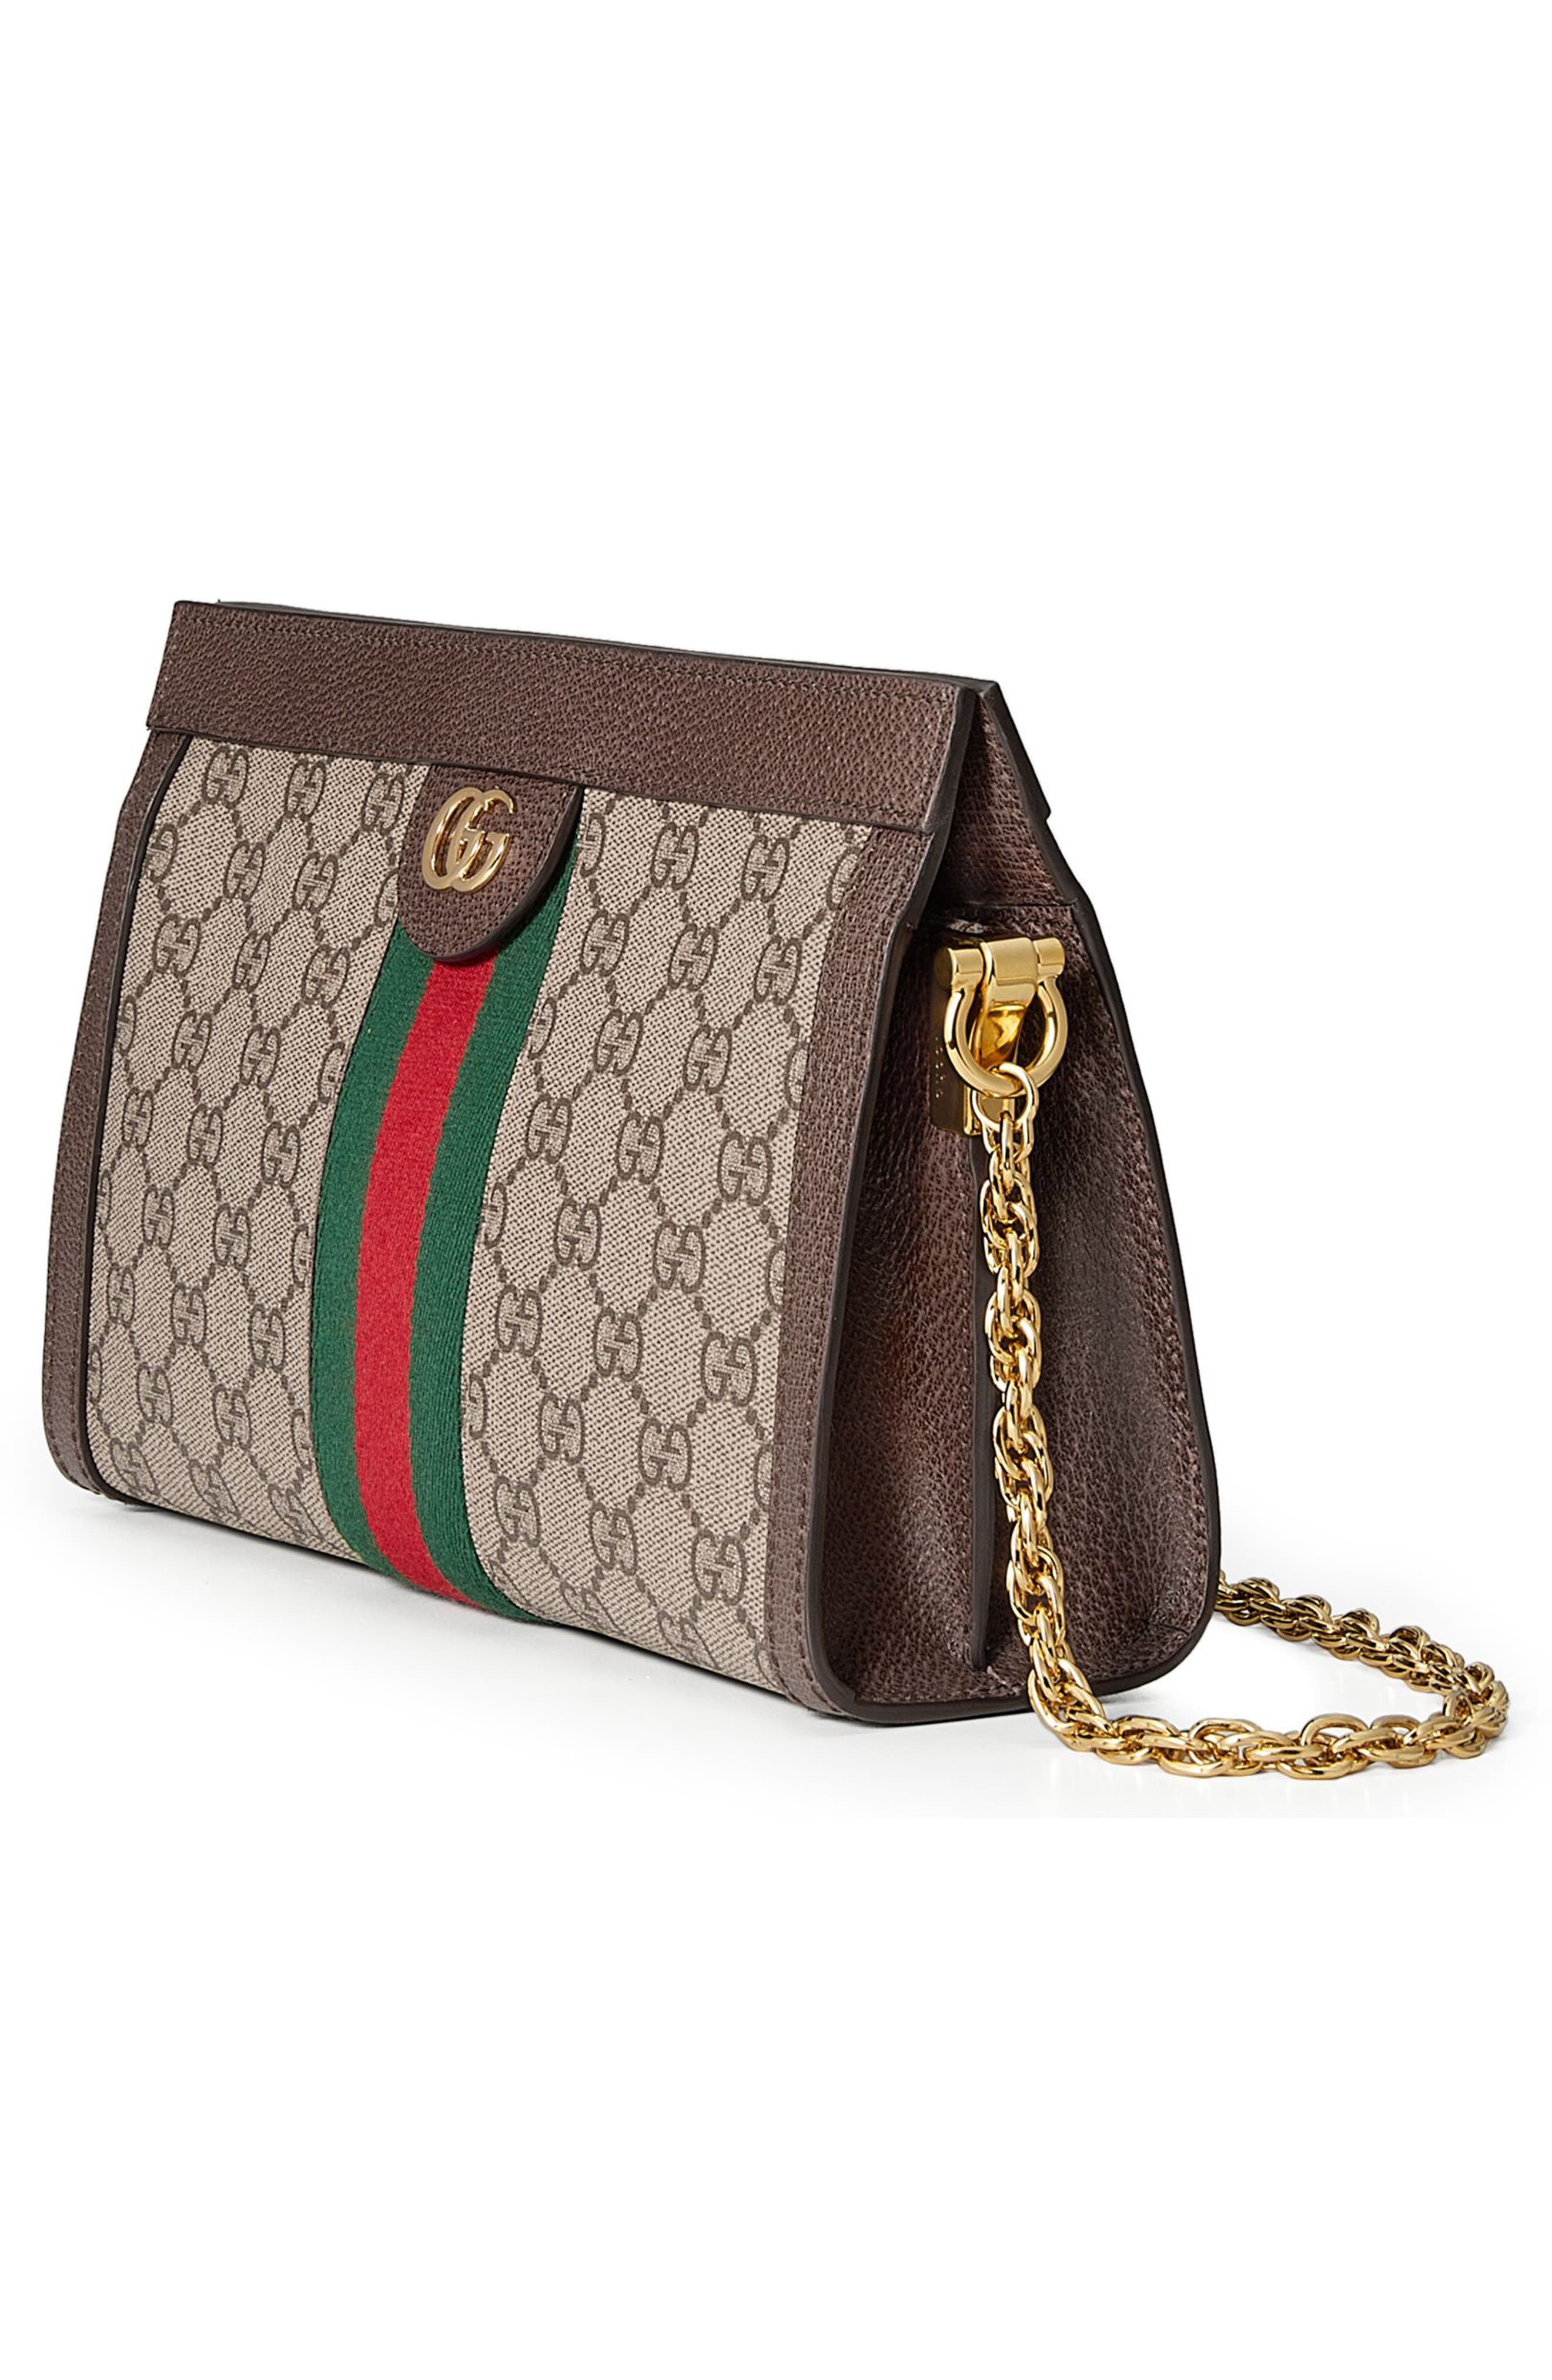 GUCCI, Small GG Supreme Shoulder Bag, Alternate thumbnail 5, color, BEIGE EBONY/ NERO/ VERT/ RED